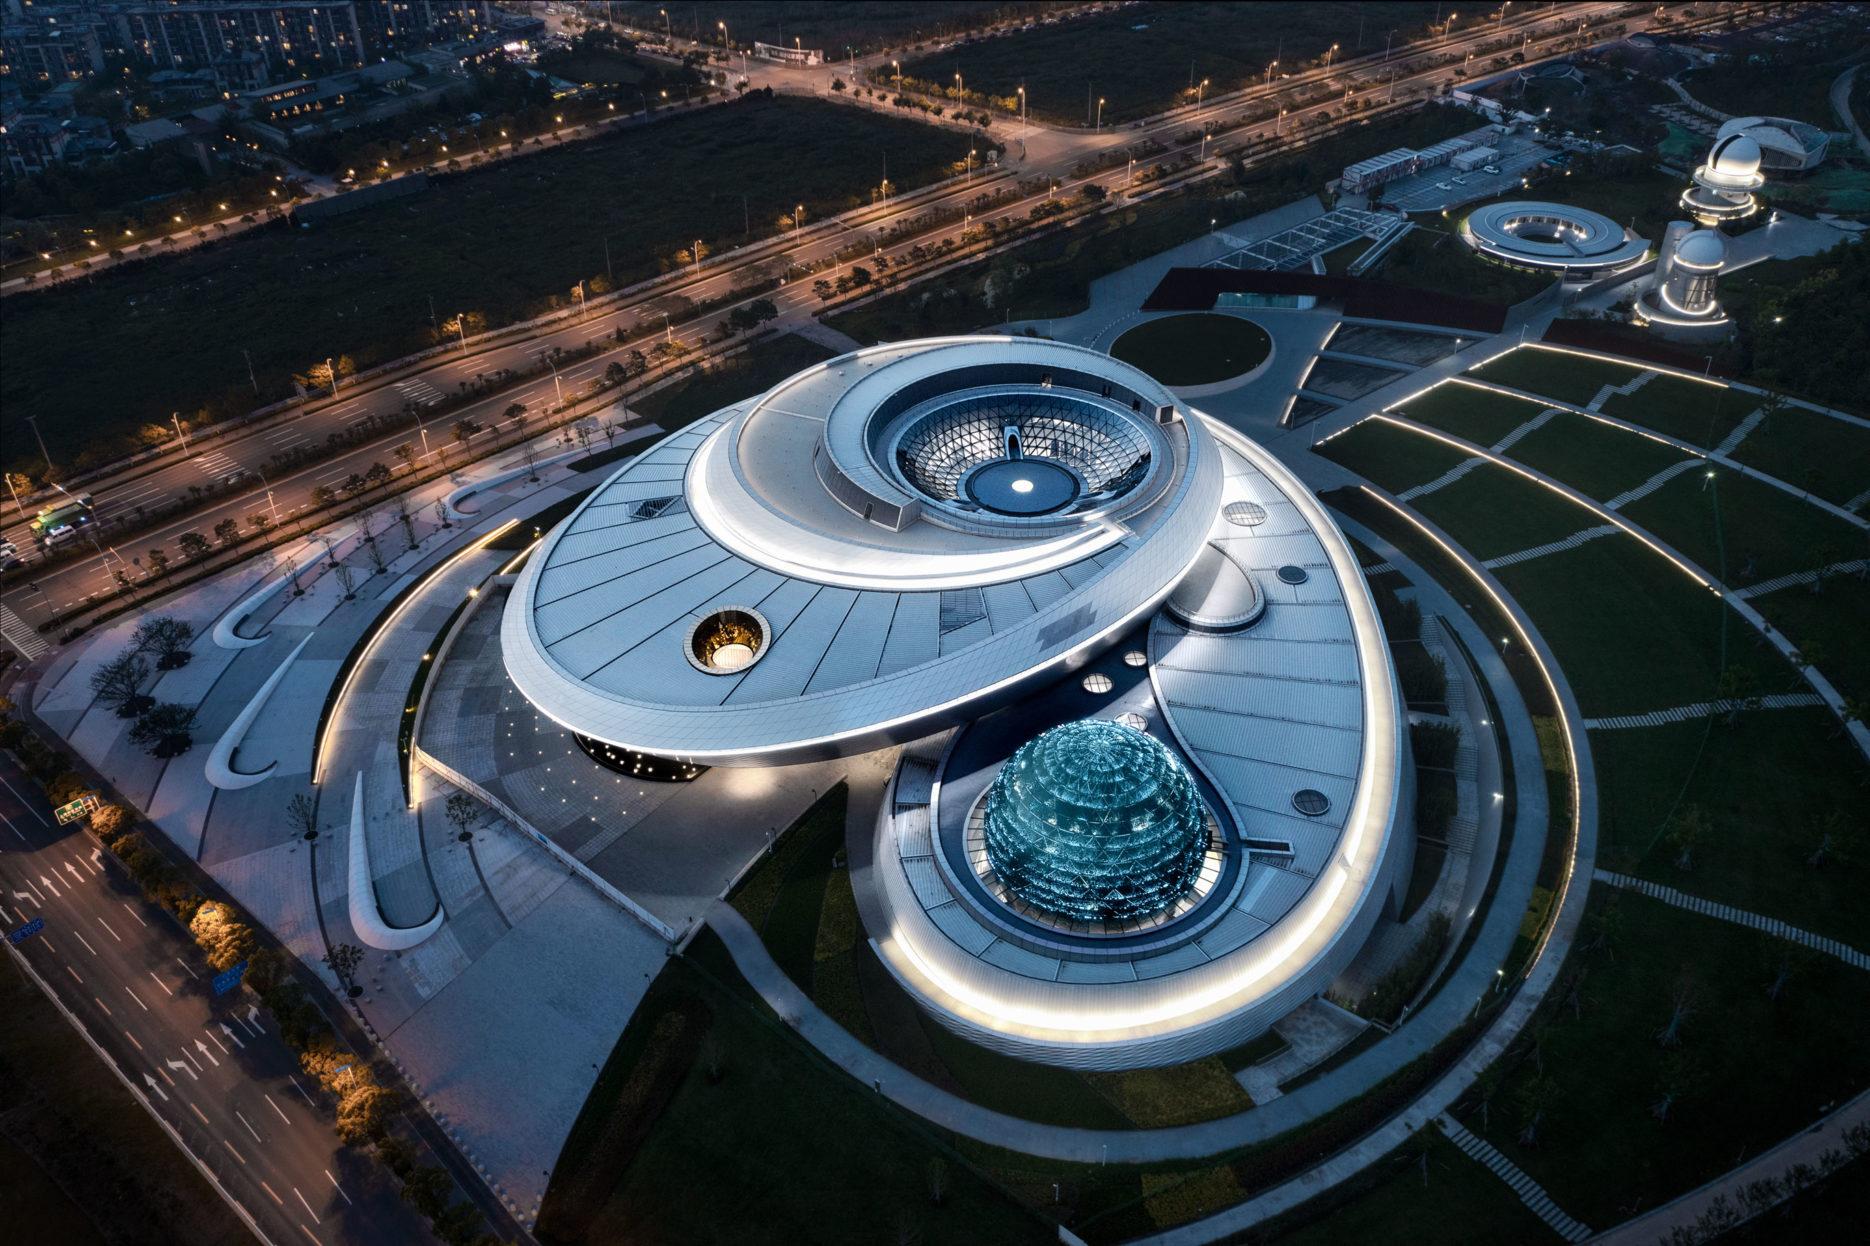 Shanghai Astronomy Museum. Credit: ennead